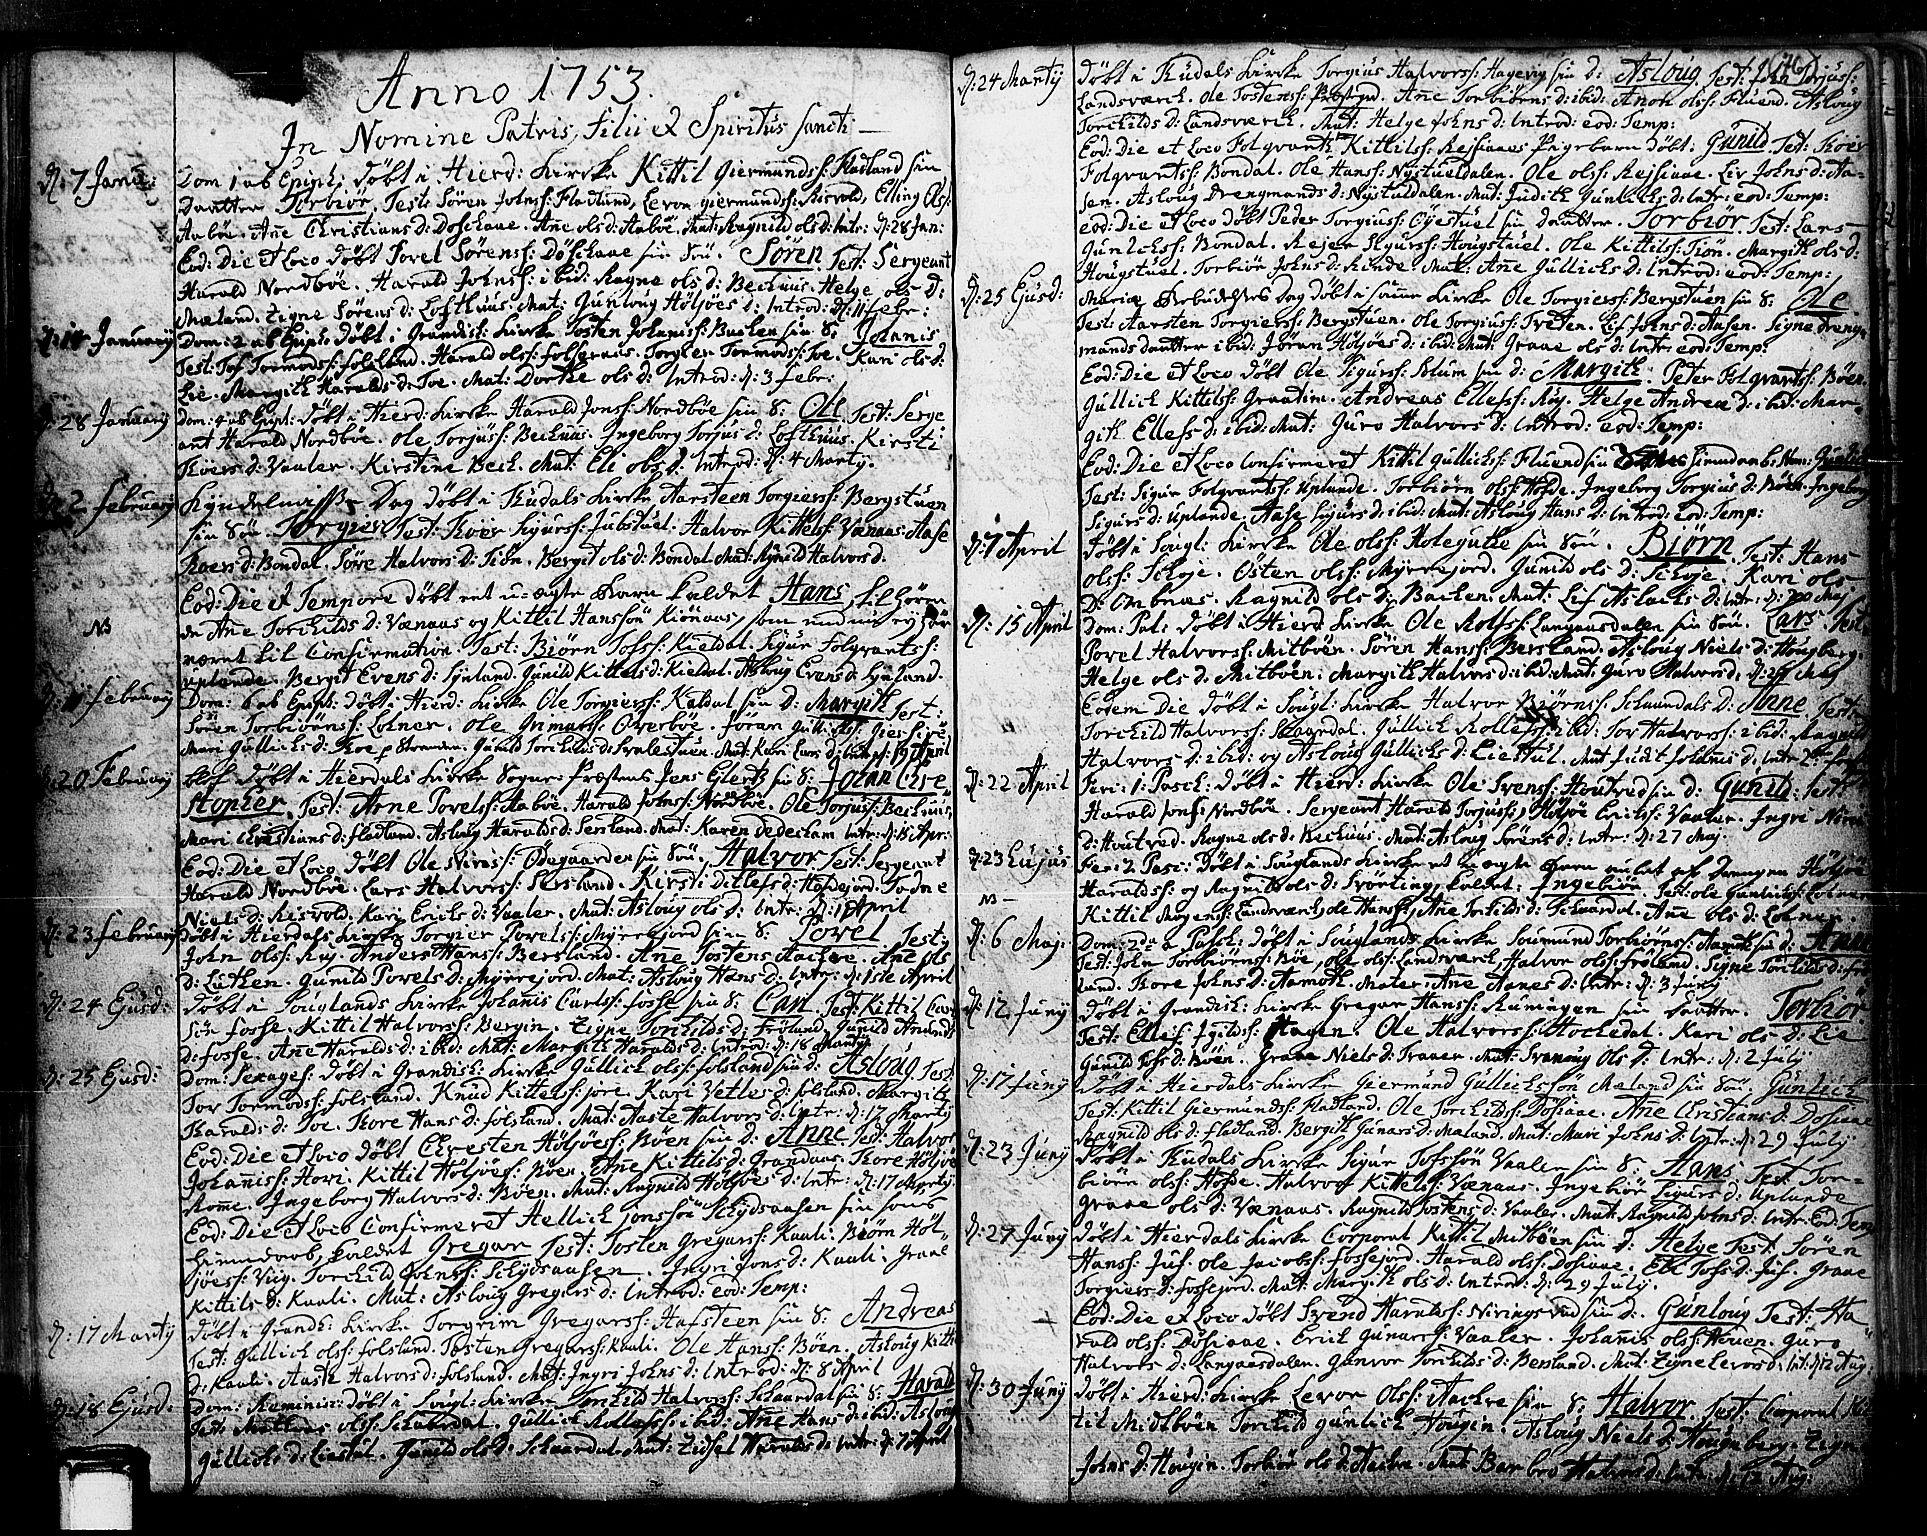 SAKO, Hjartdal kirkebøker, F/Fa/L0003: Ministerialbok nr. I 3, 1727-1775, s. 76